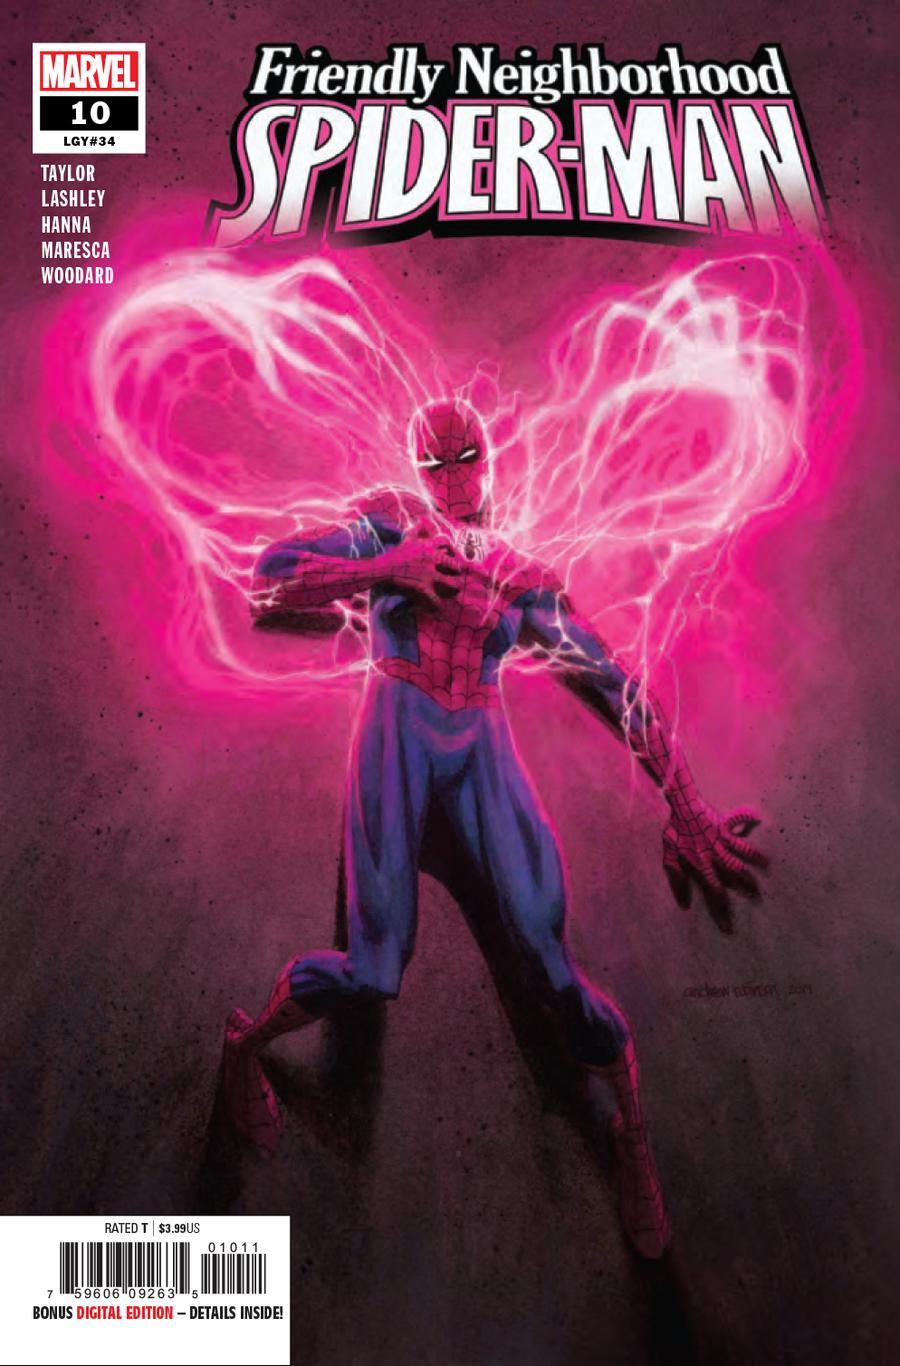 Friendly Neighborhood Spider-Man Vol 2 #10 Cover A Regular Andrew C Robinson Cover